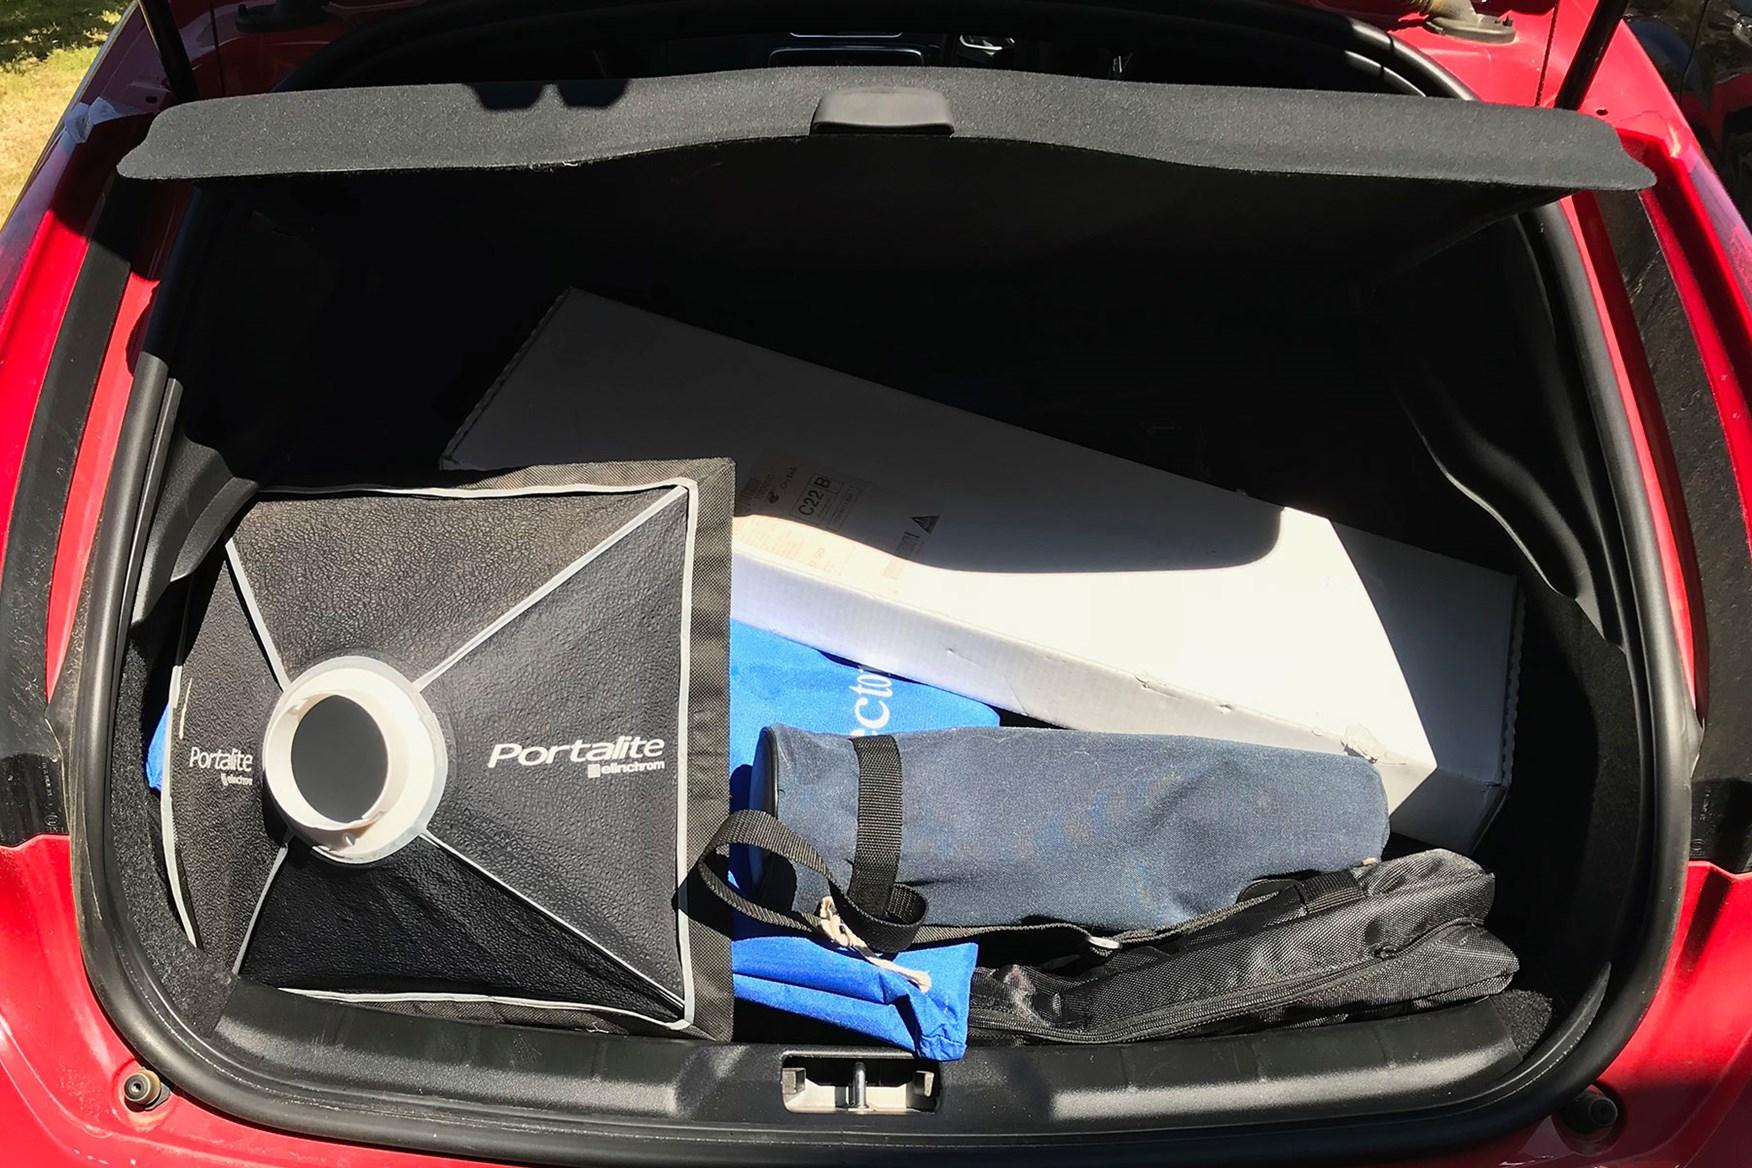 2016 Volvo V40 D4 R Design large boot full of photographic equipment